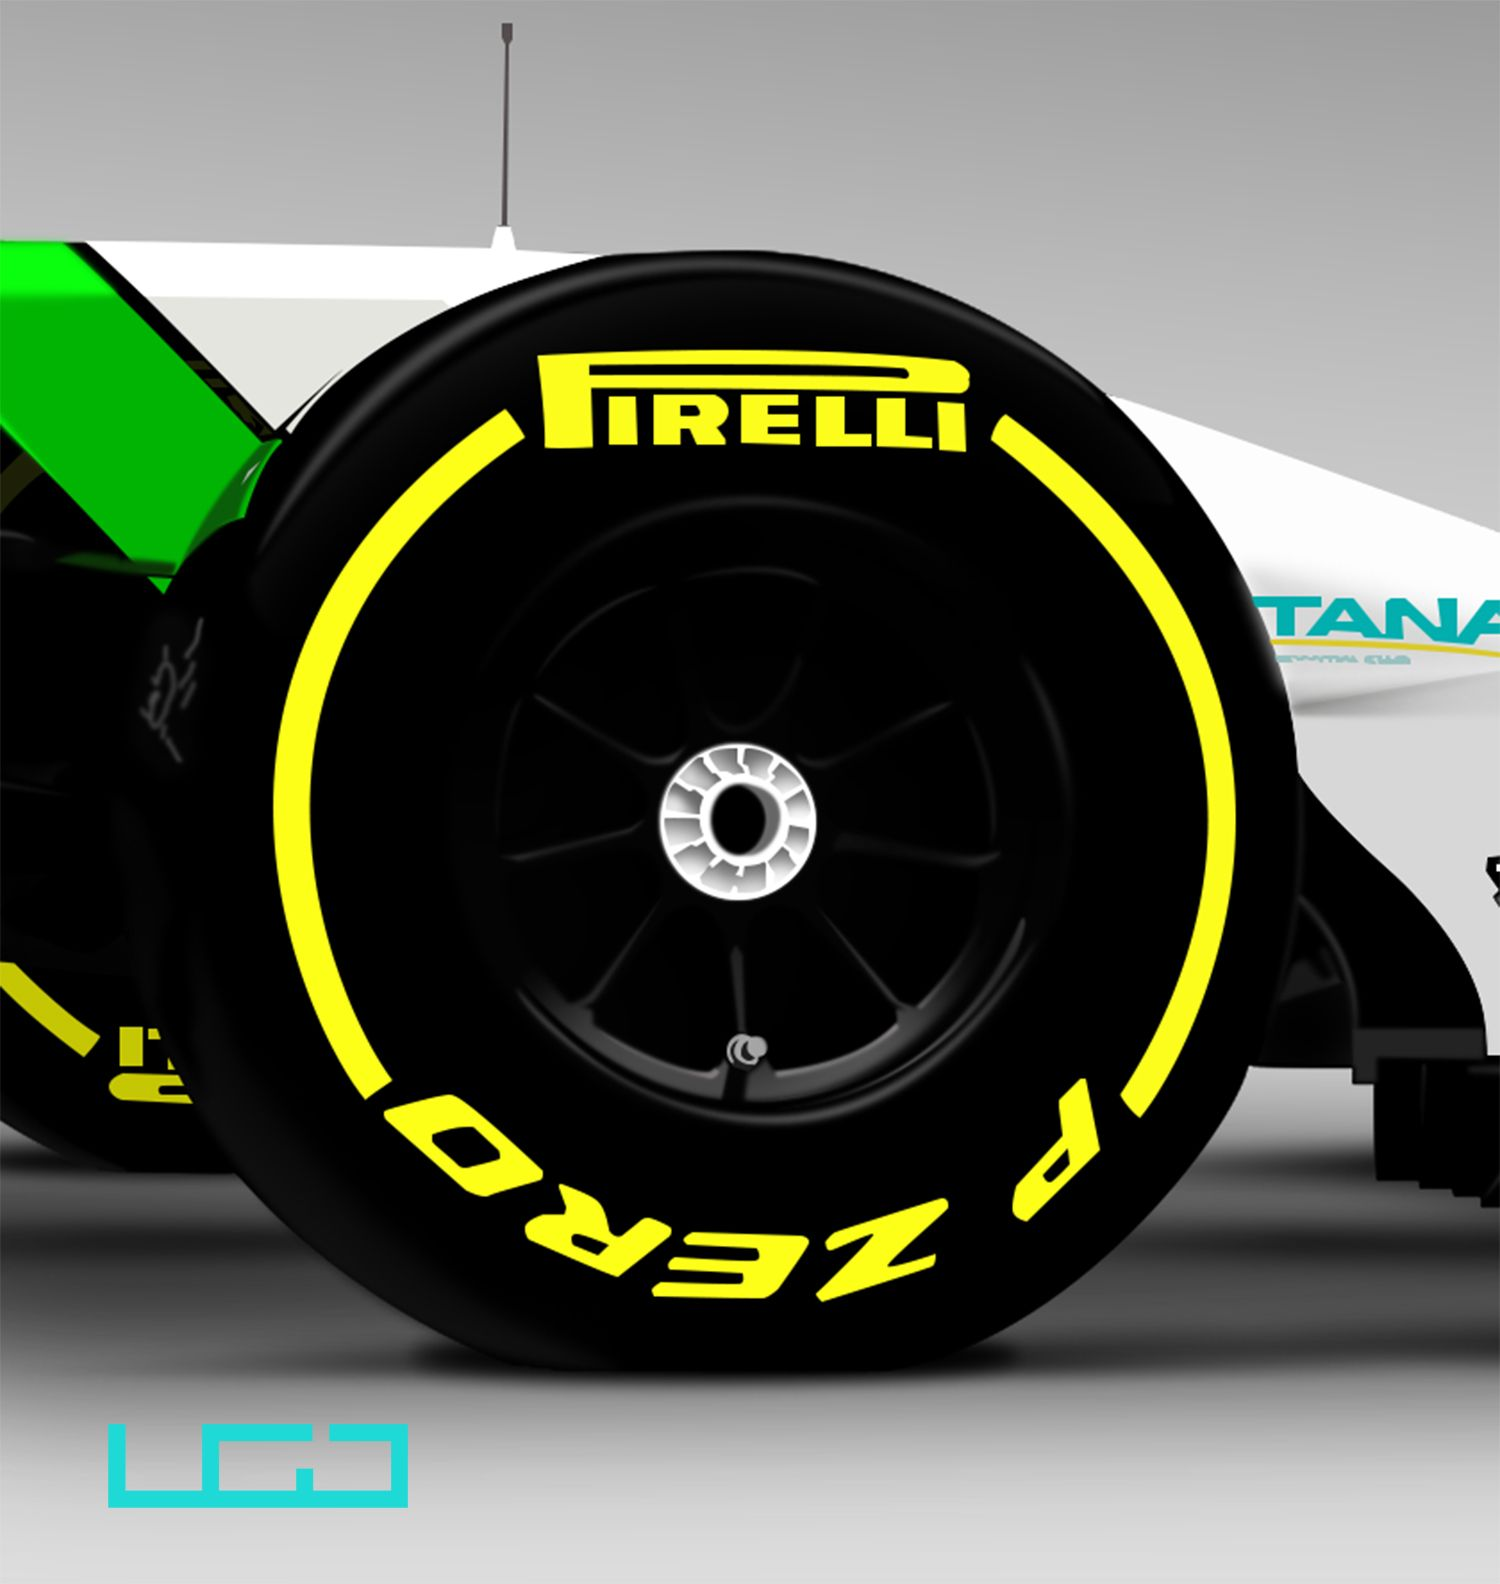 Continental Tire Stickers >> F1 Pirelli tyre | Pirelli tires, Future car, Ferrari